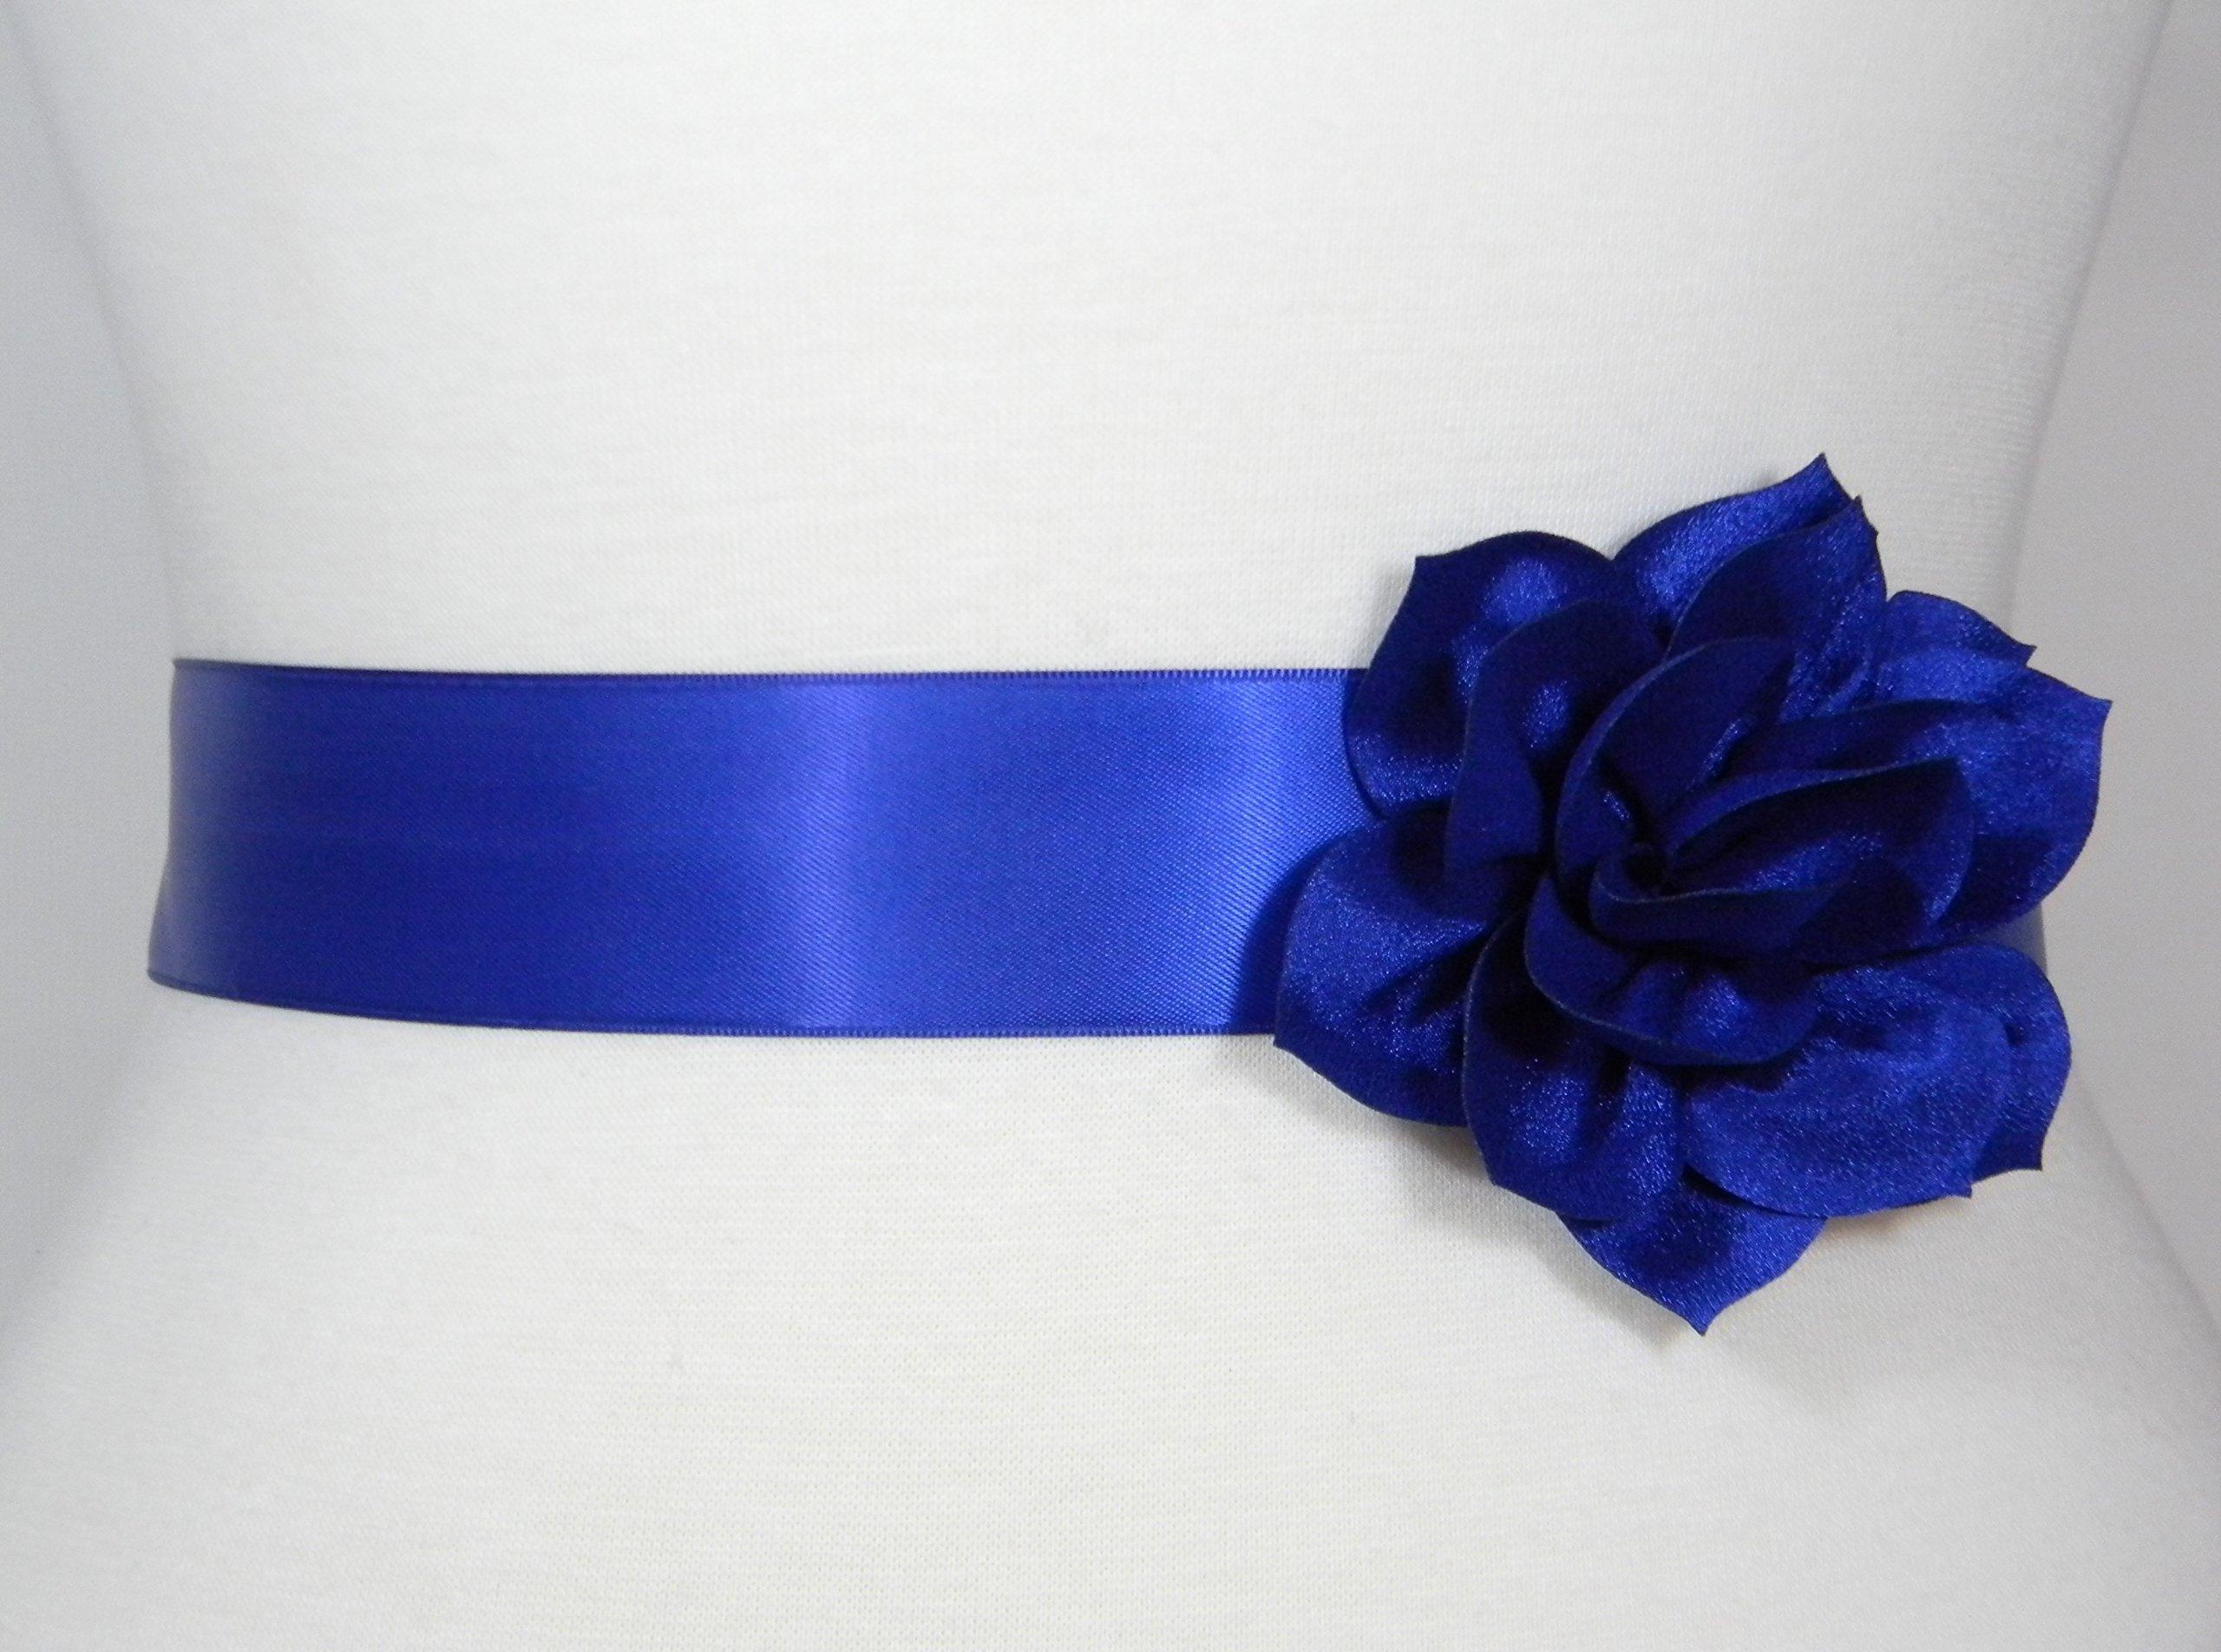 Royal Blue Bridal Sash, Wedding Belt, Bridal Belt, Flower Girl Dress Sash, Bridesmaid Belt, Satin Sash, Wedding Dress Belt, Simple Sash POSY